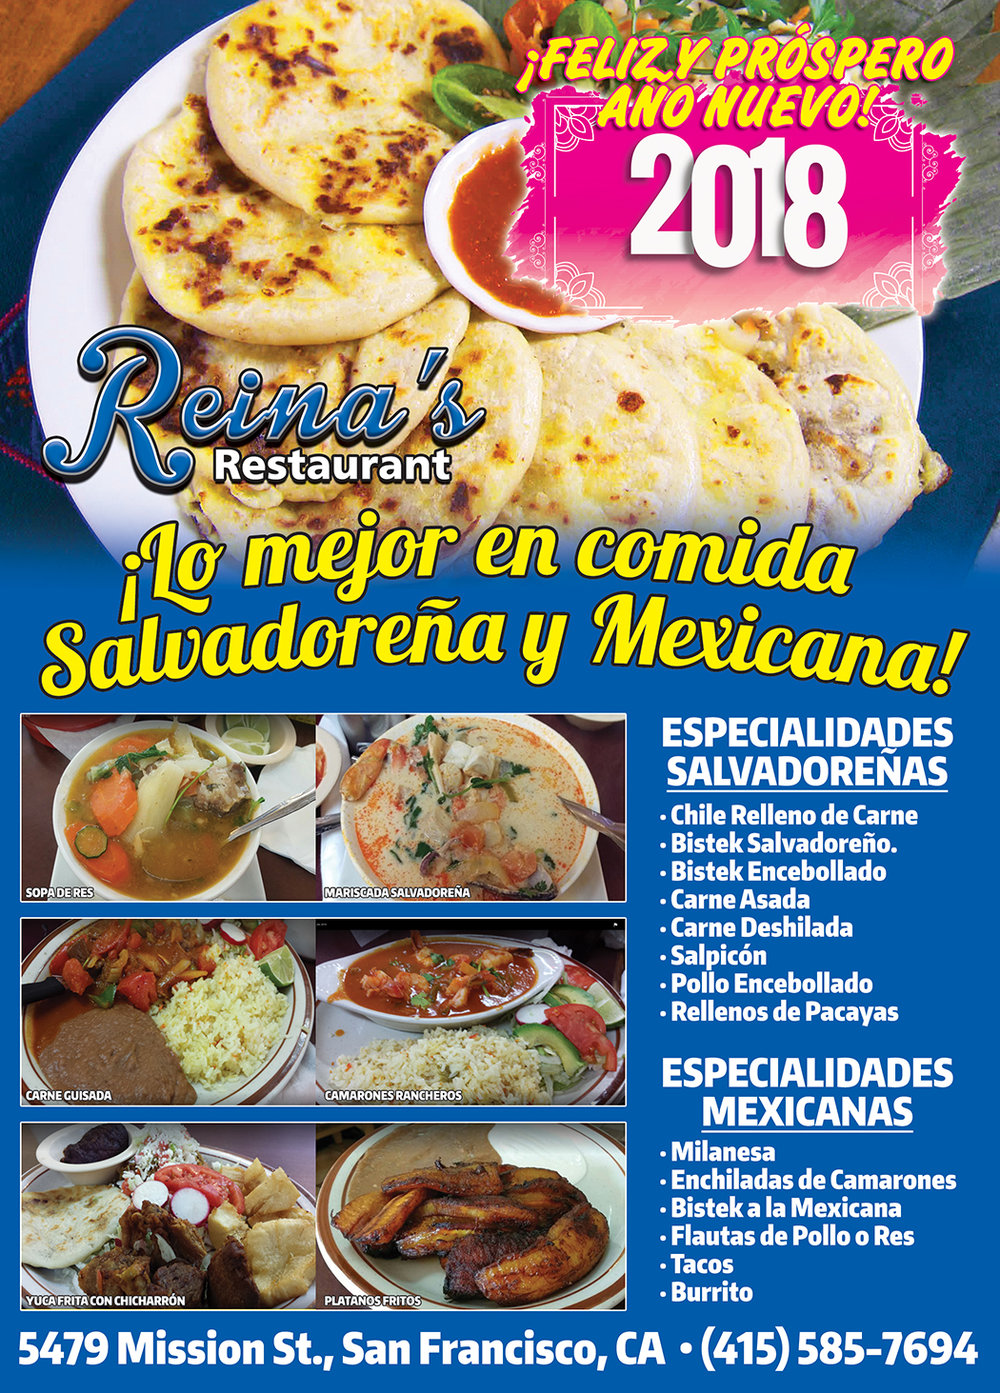 Reinas Restaurant 1 pag - ENERO 2018.jpg